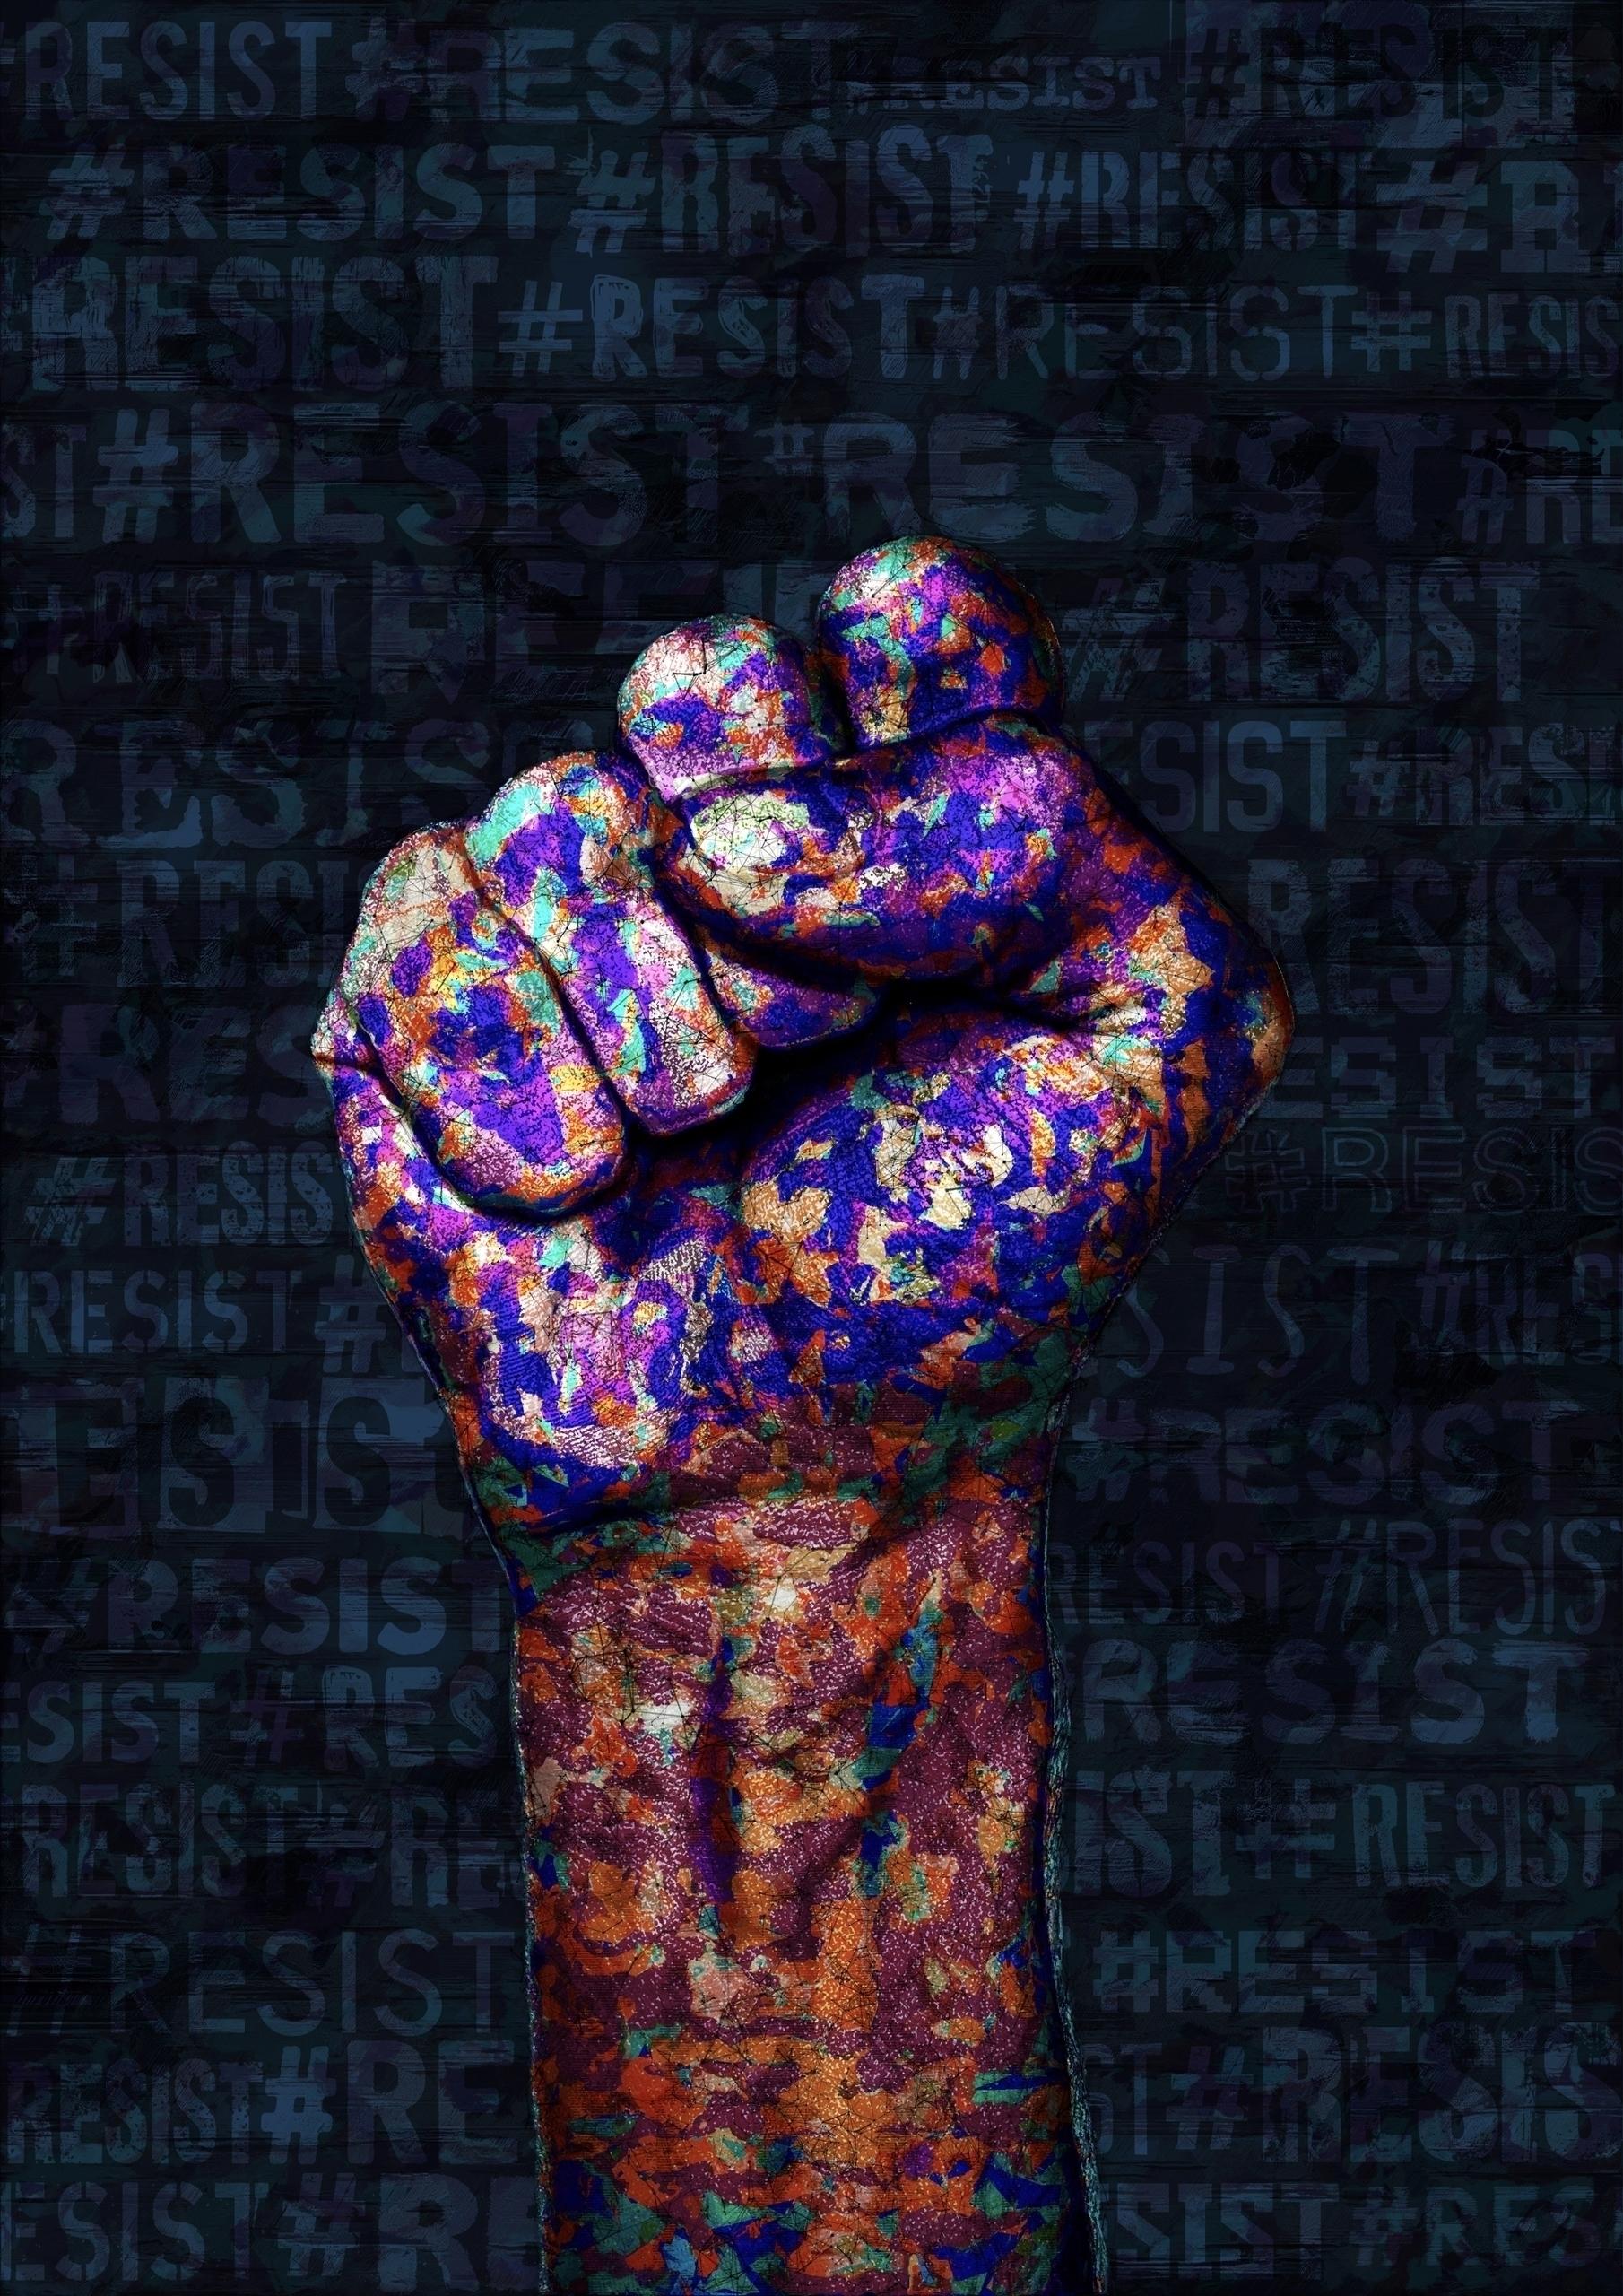 Resist, resistance, resist xeno - ferreiraricardo | ello